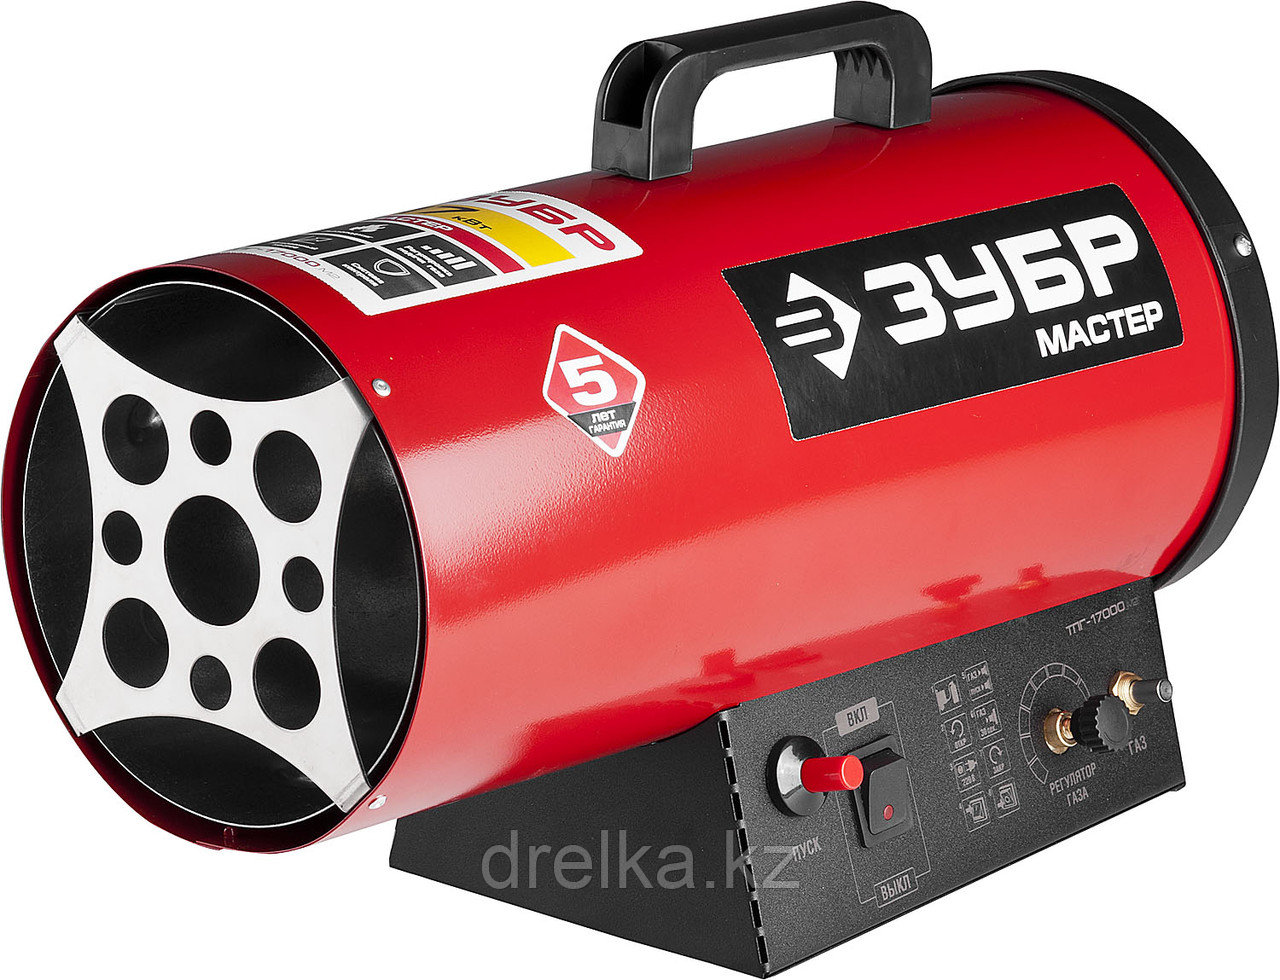 Тепловая пушка газовая ЗУБР ТПГ-17000_М2, МАСТЕР, 220 В, 17,0 кВт, 330м.куб/час, 1,4кг/ч.